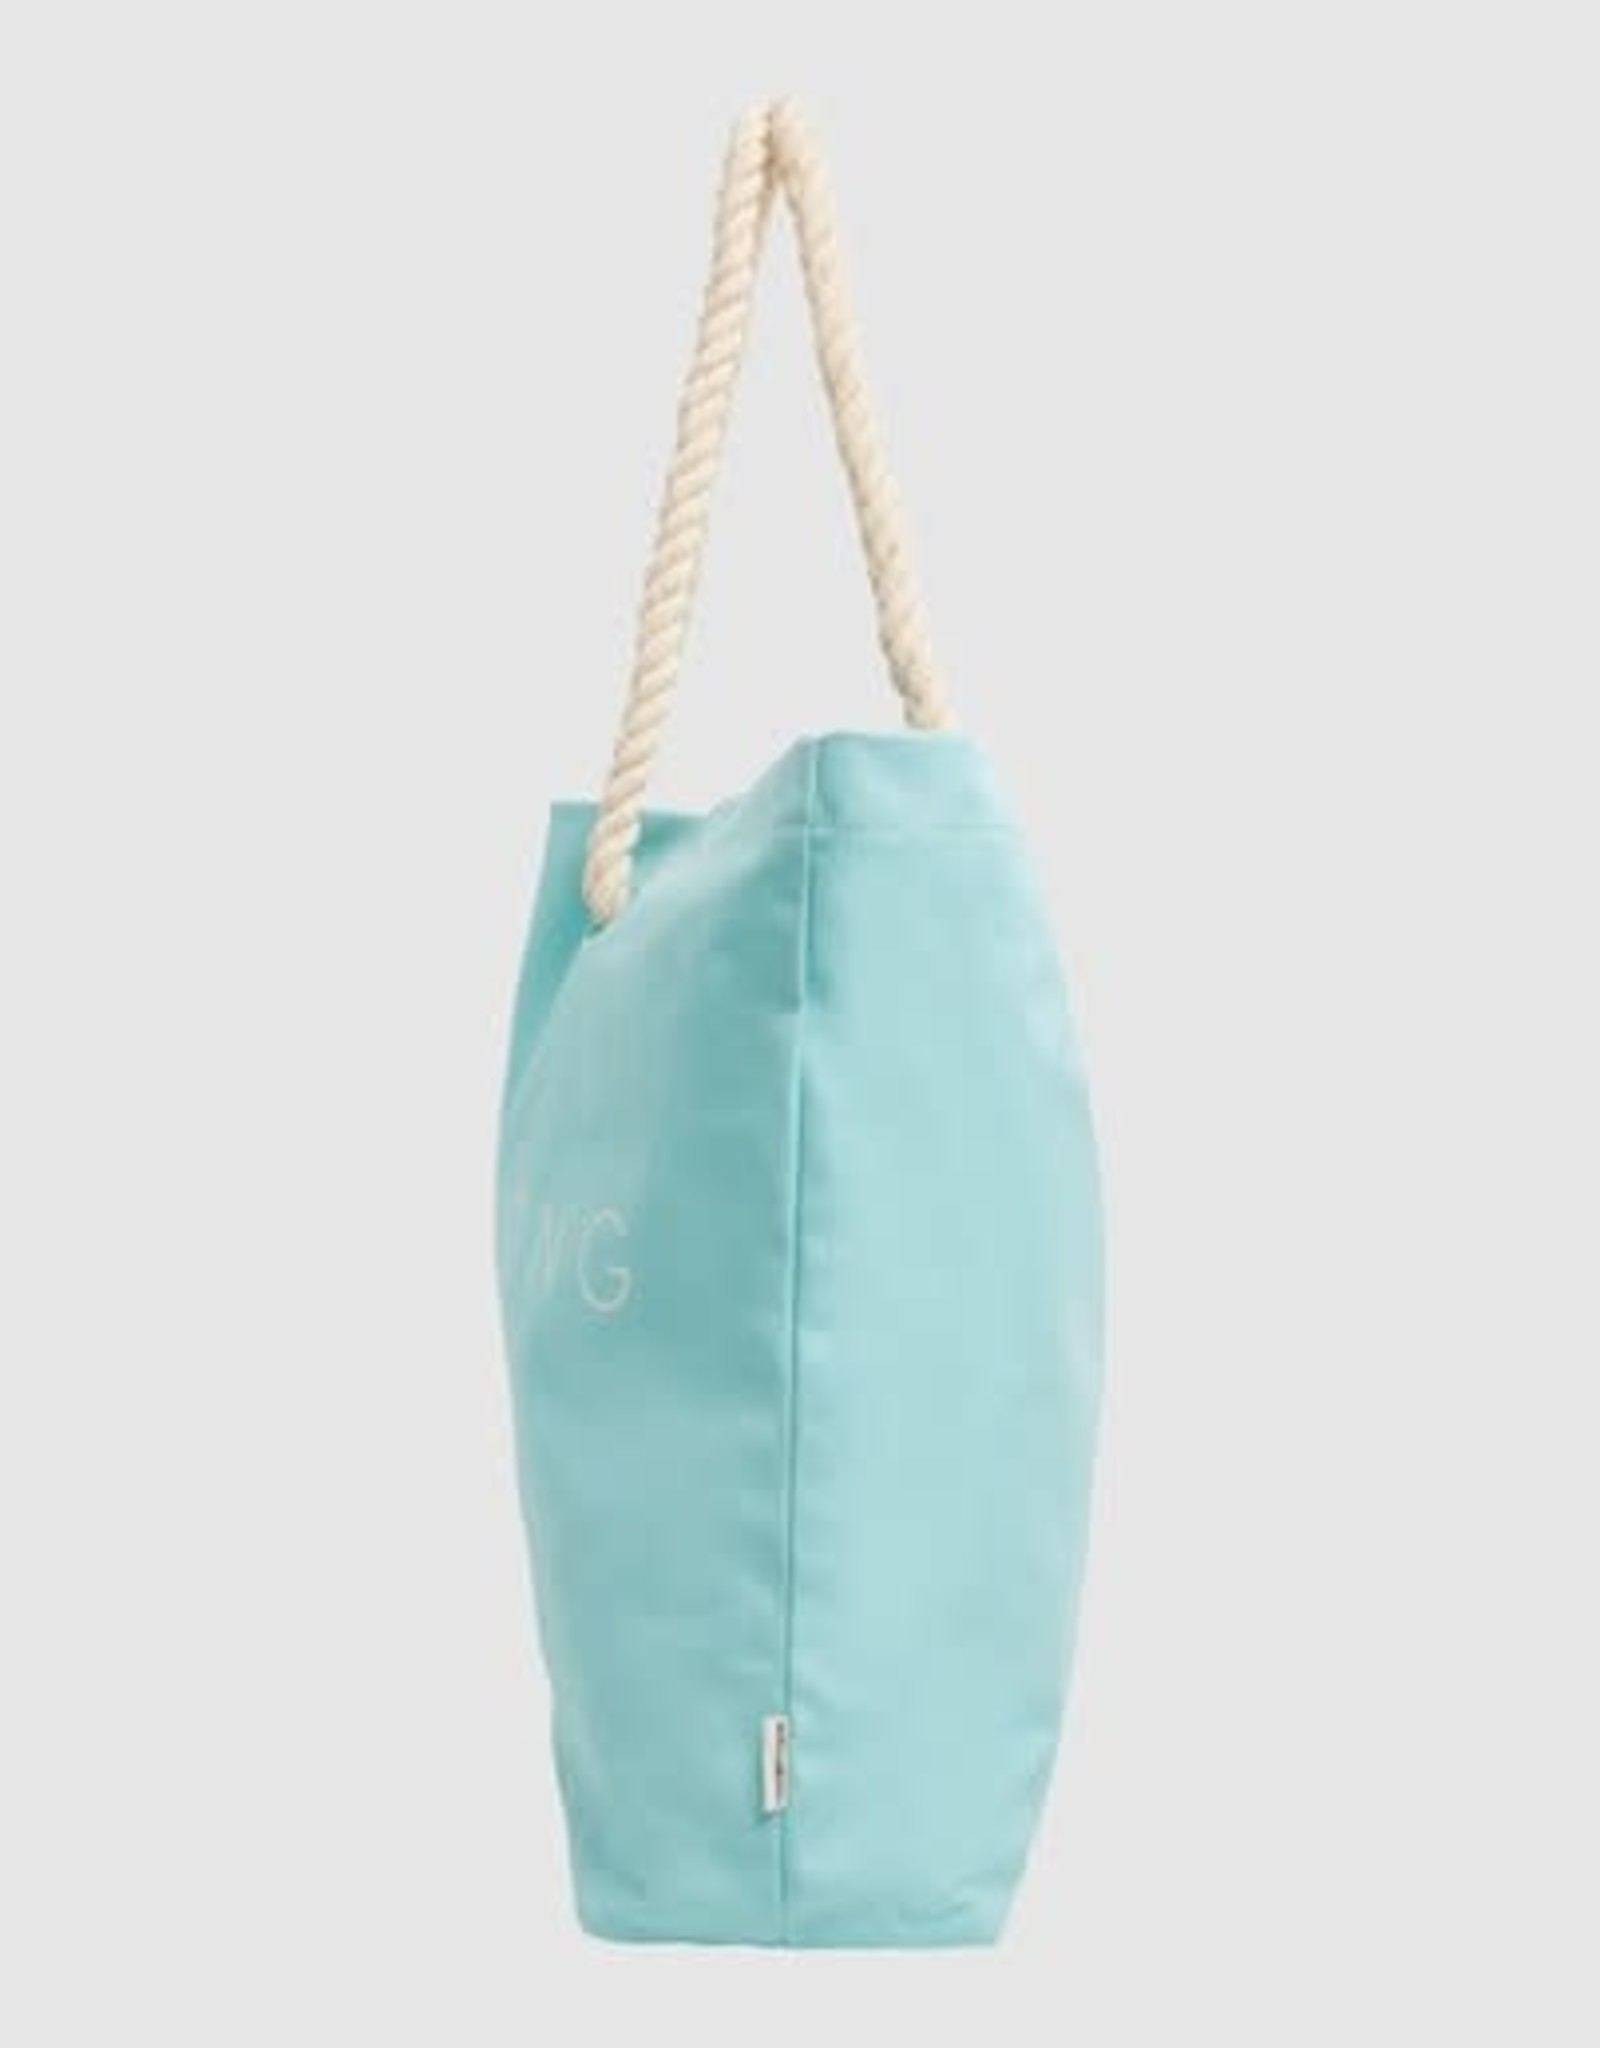 BILLABONG Serenity Beach Bag - Mermaid